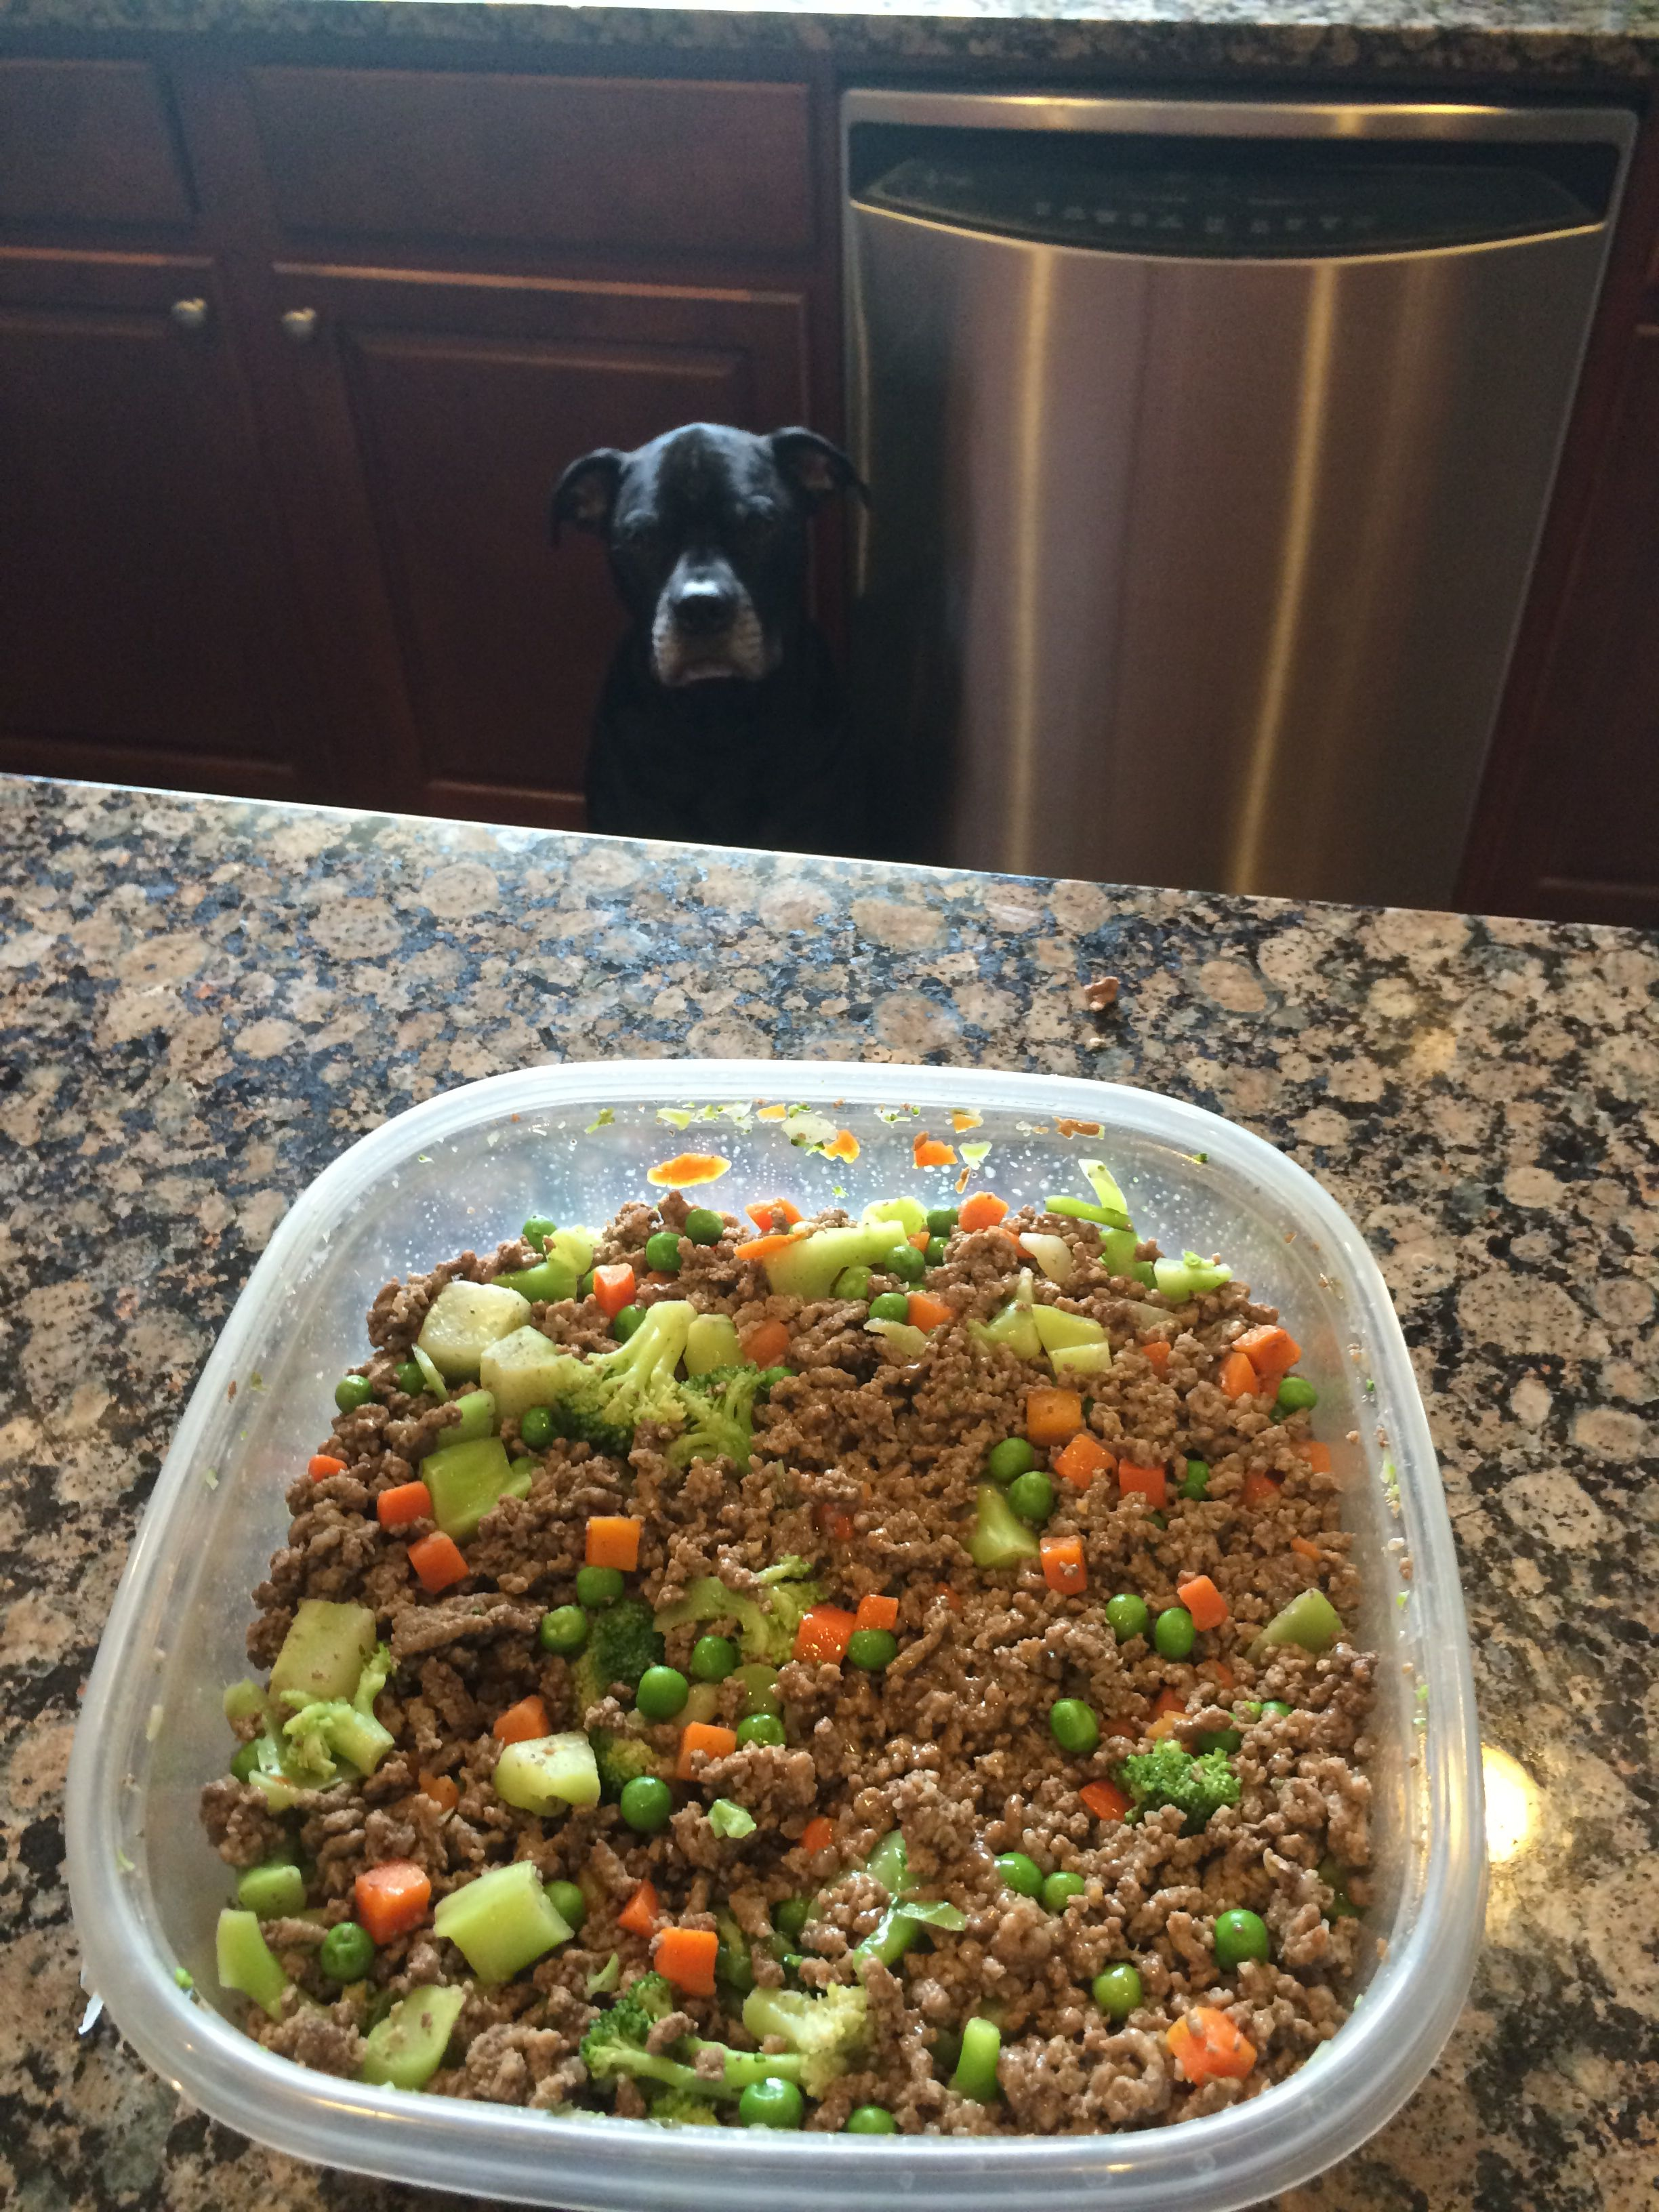 Easy Homemade Dog Food Meal Dog Food Recipes Homemade Dog Food